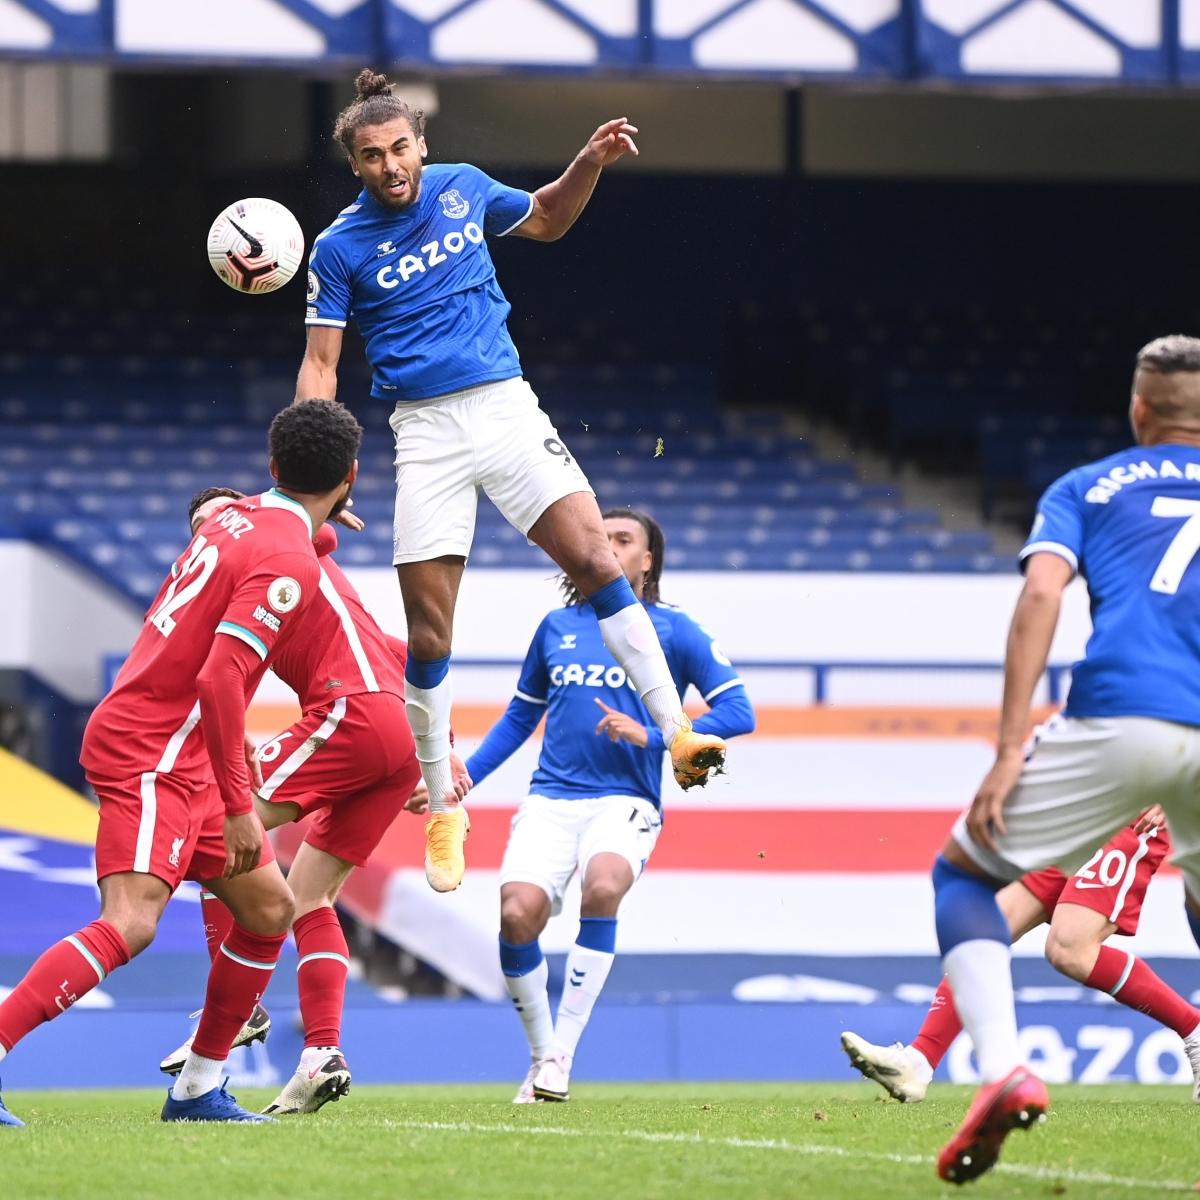 Premier League: Calvert-Lewin earns Everton 2-2 draw with Liverpool